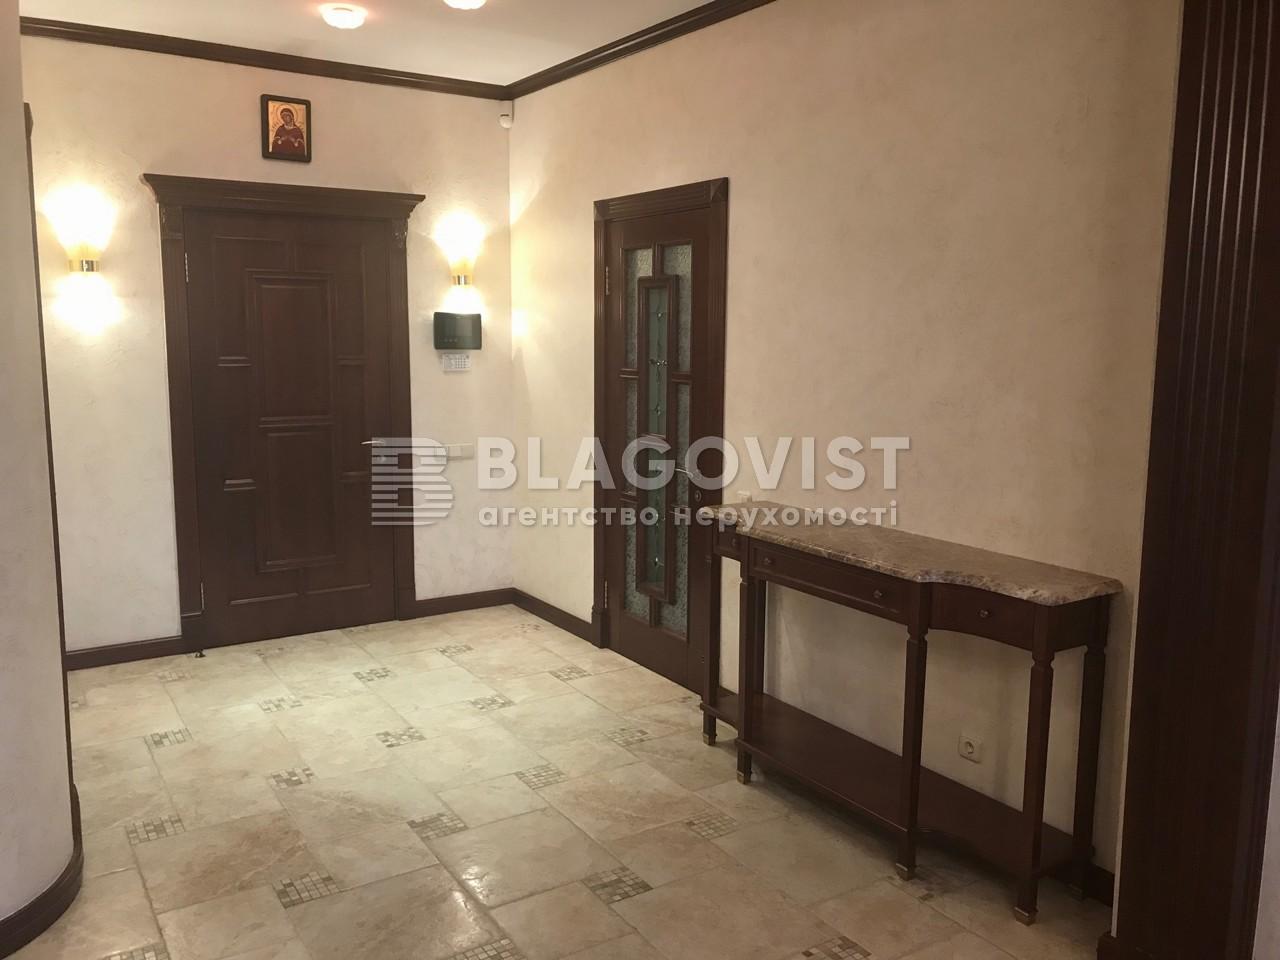 Квартира R-14951, Жилянская, 59, Киев - Фото 24